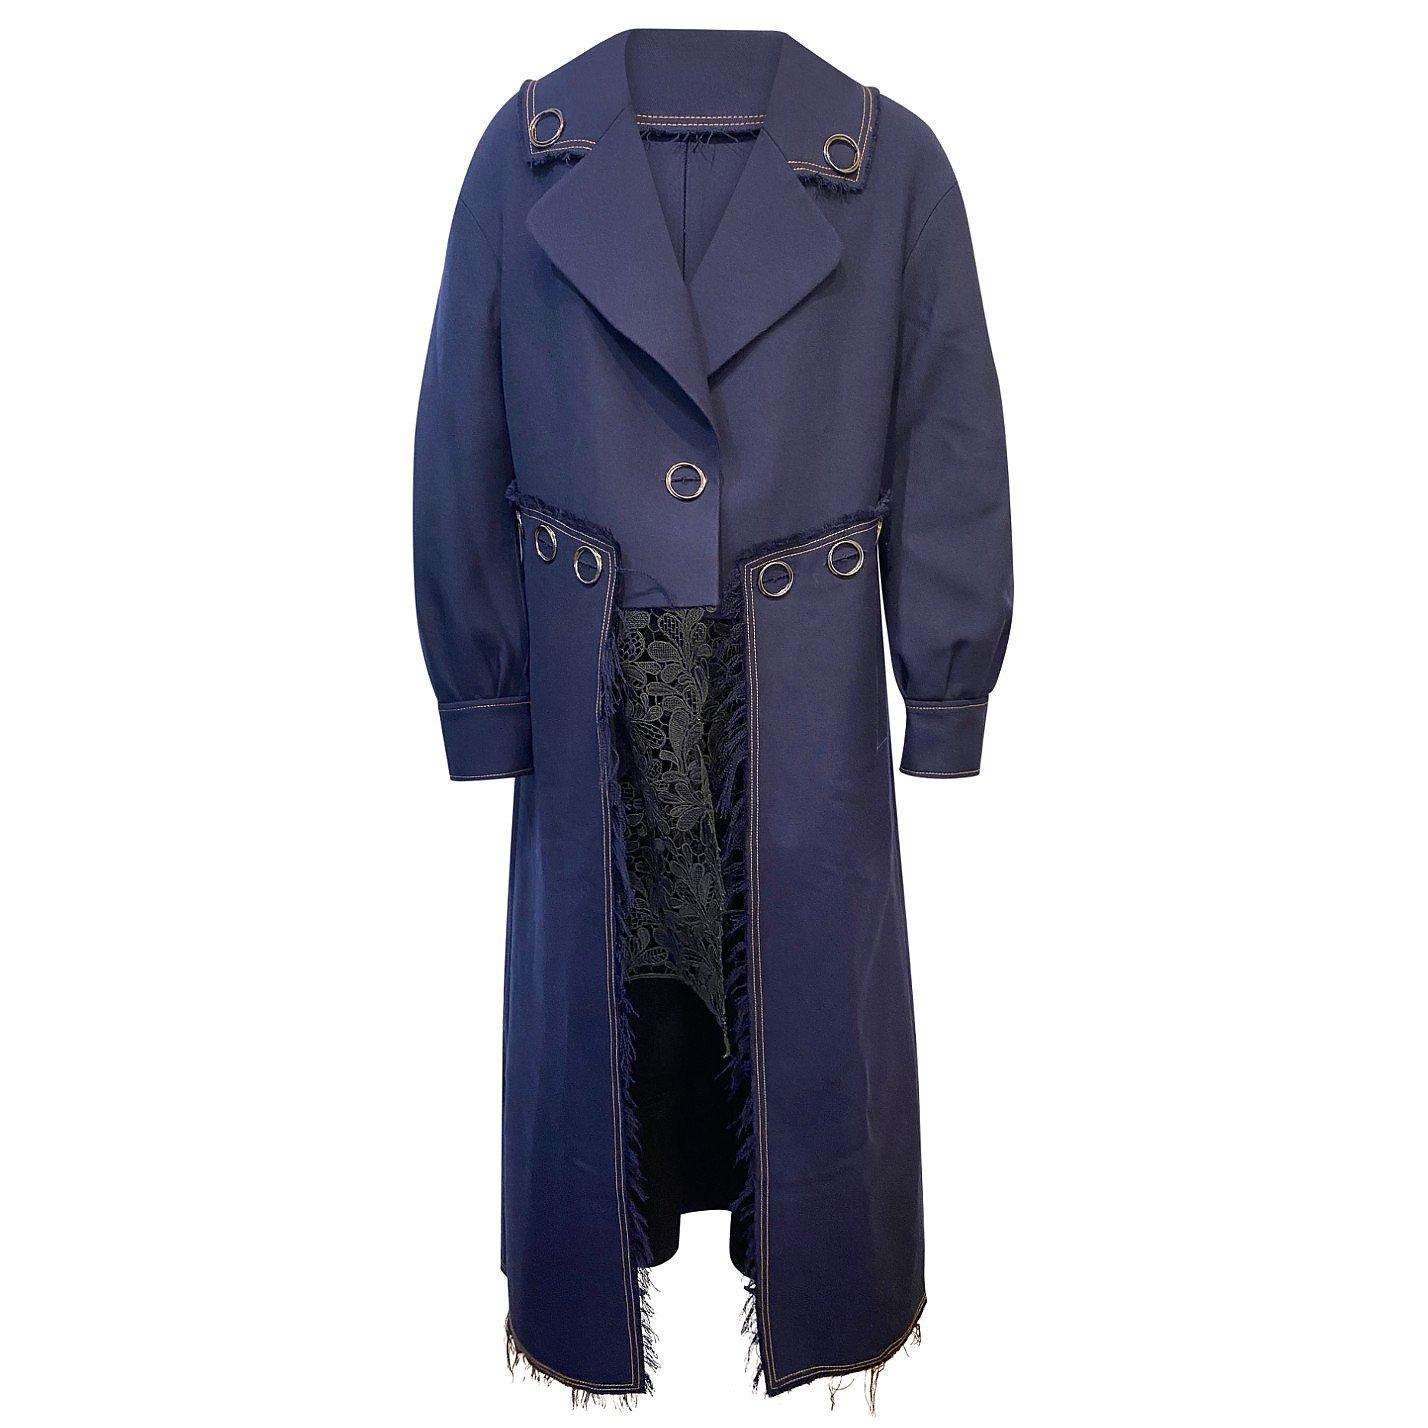 Whole 9 Yards Lace-Detail Coat